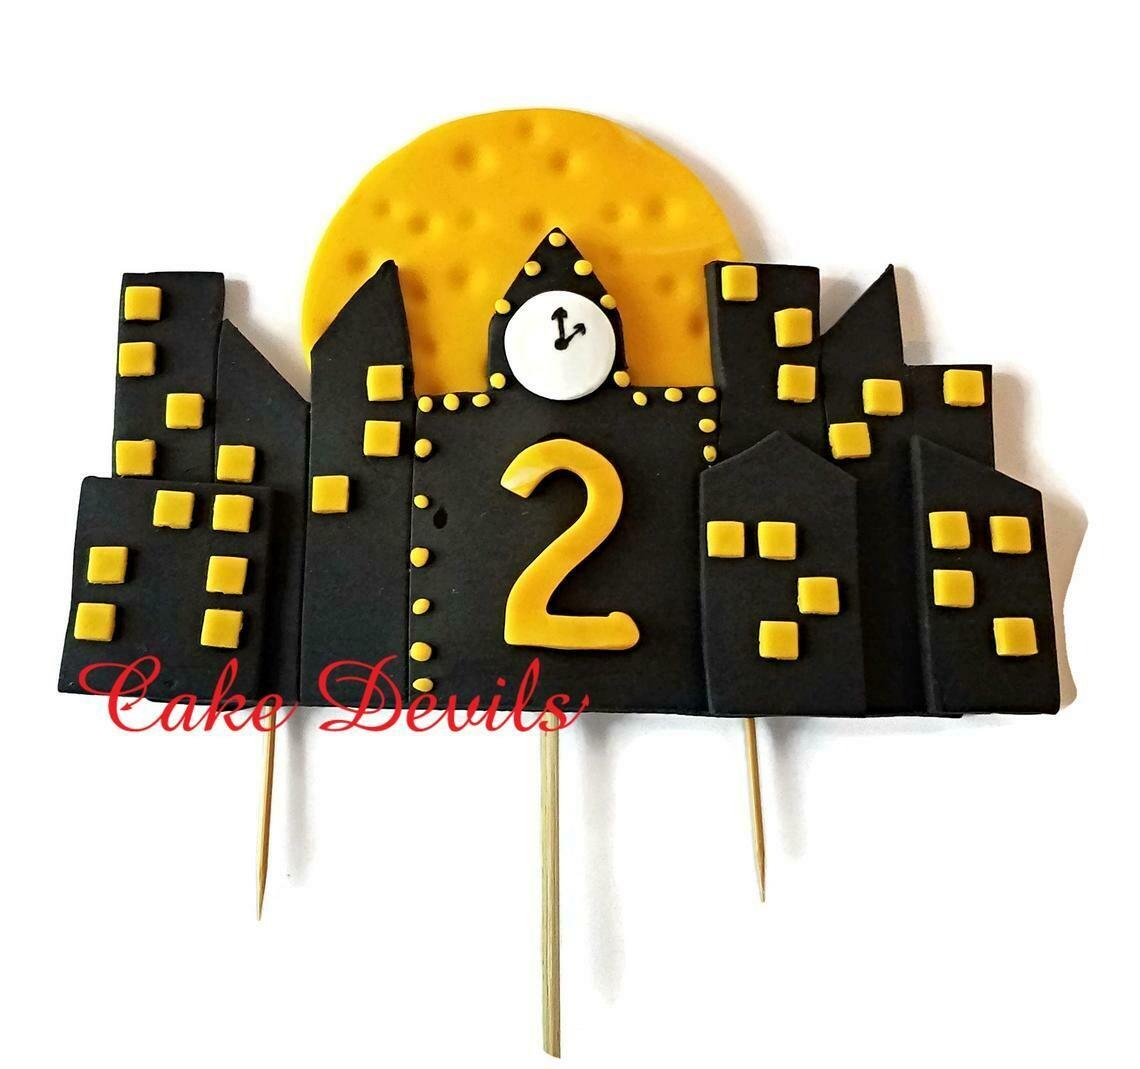 Superhero Buildings Cake Topper, Fondant Night Scene Cake Decorations